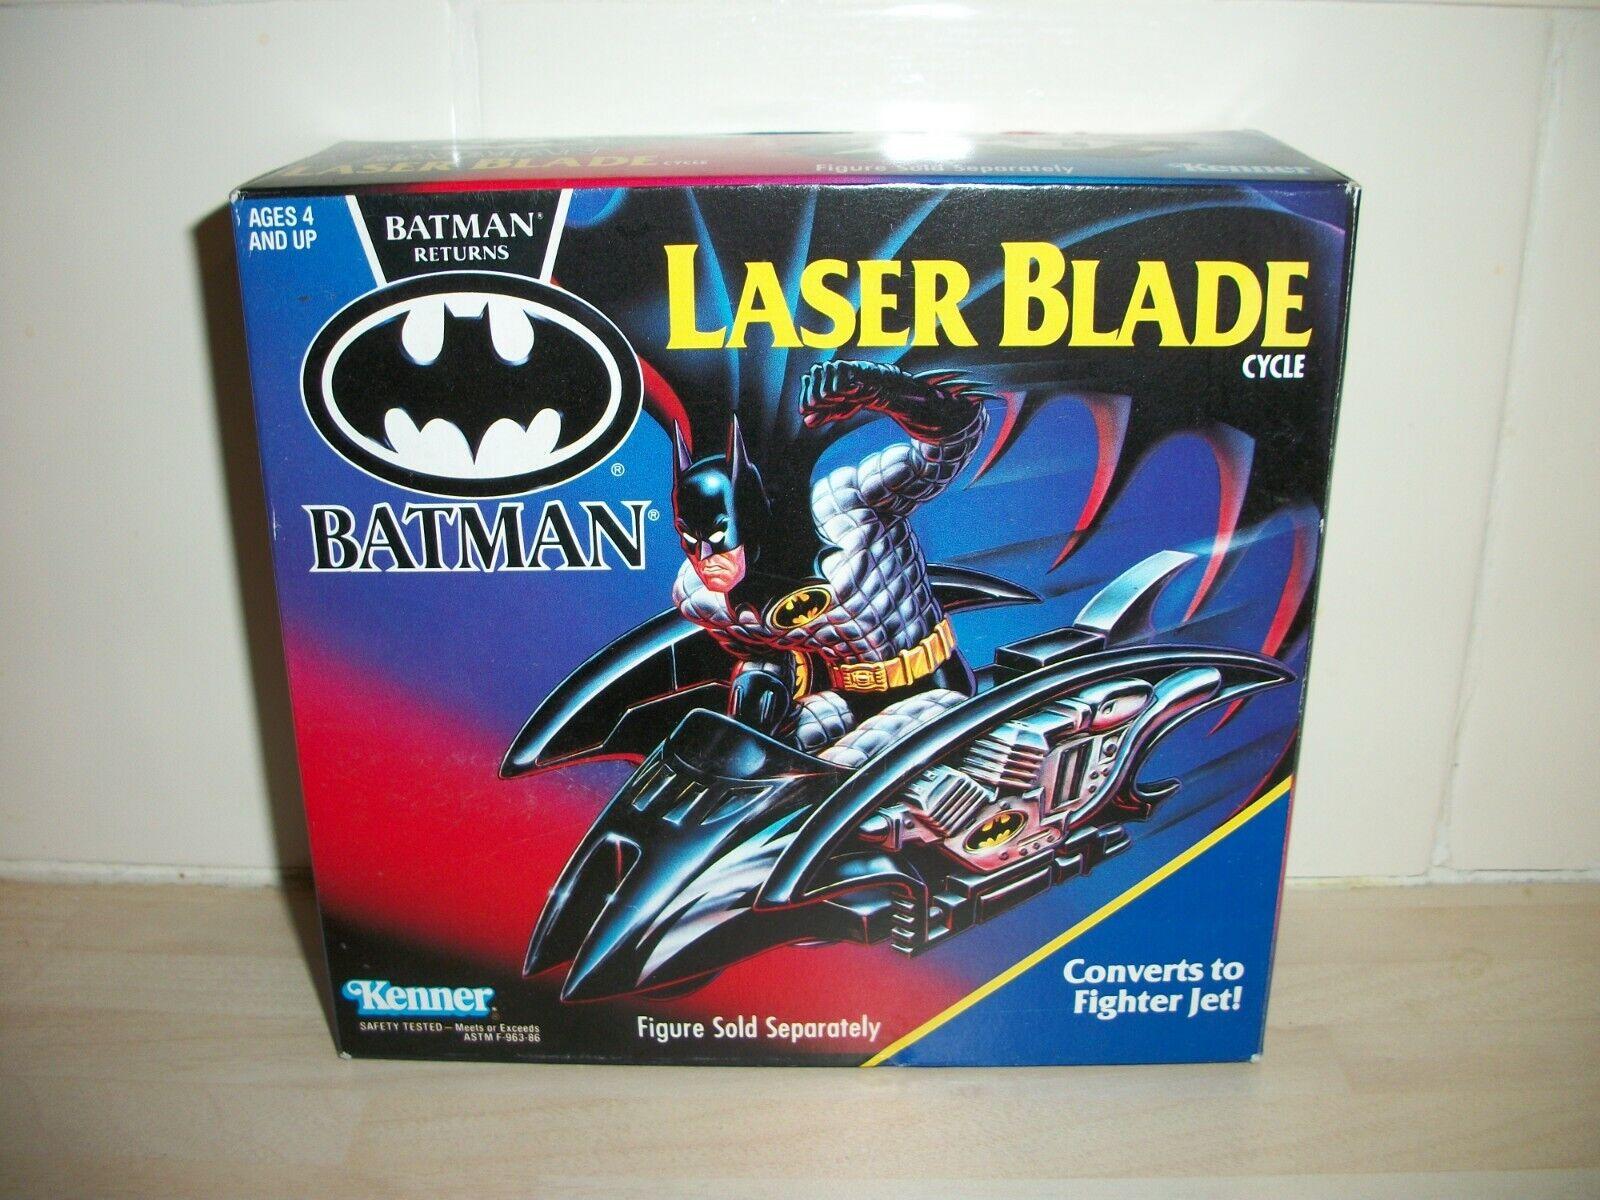 Kenner Batman Returns Batman's Laser Blade Cycle (MIB)